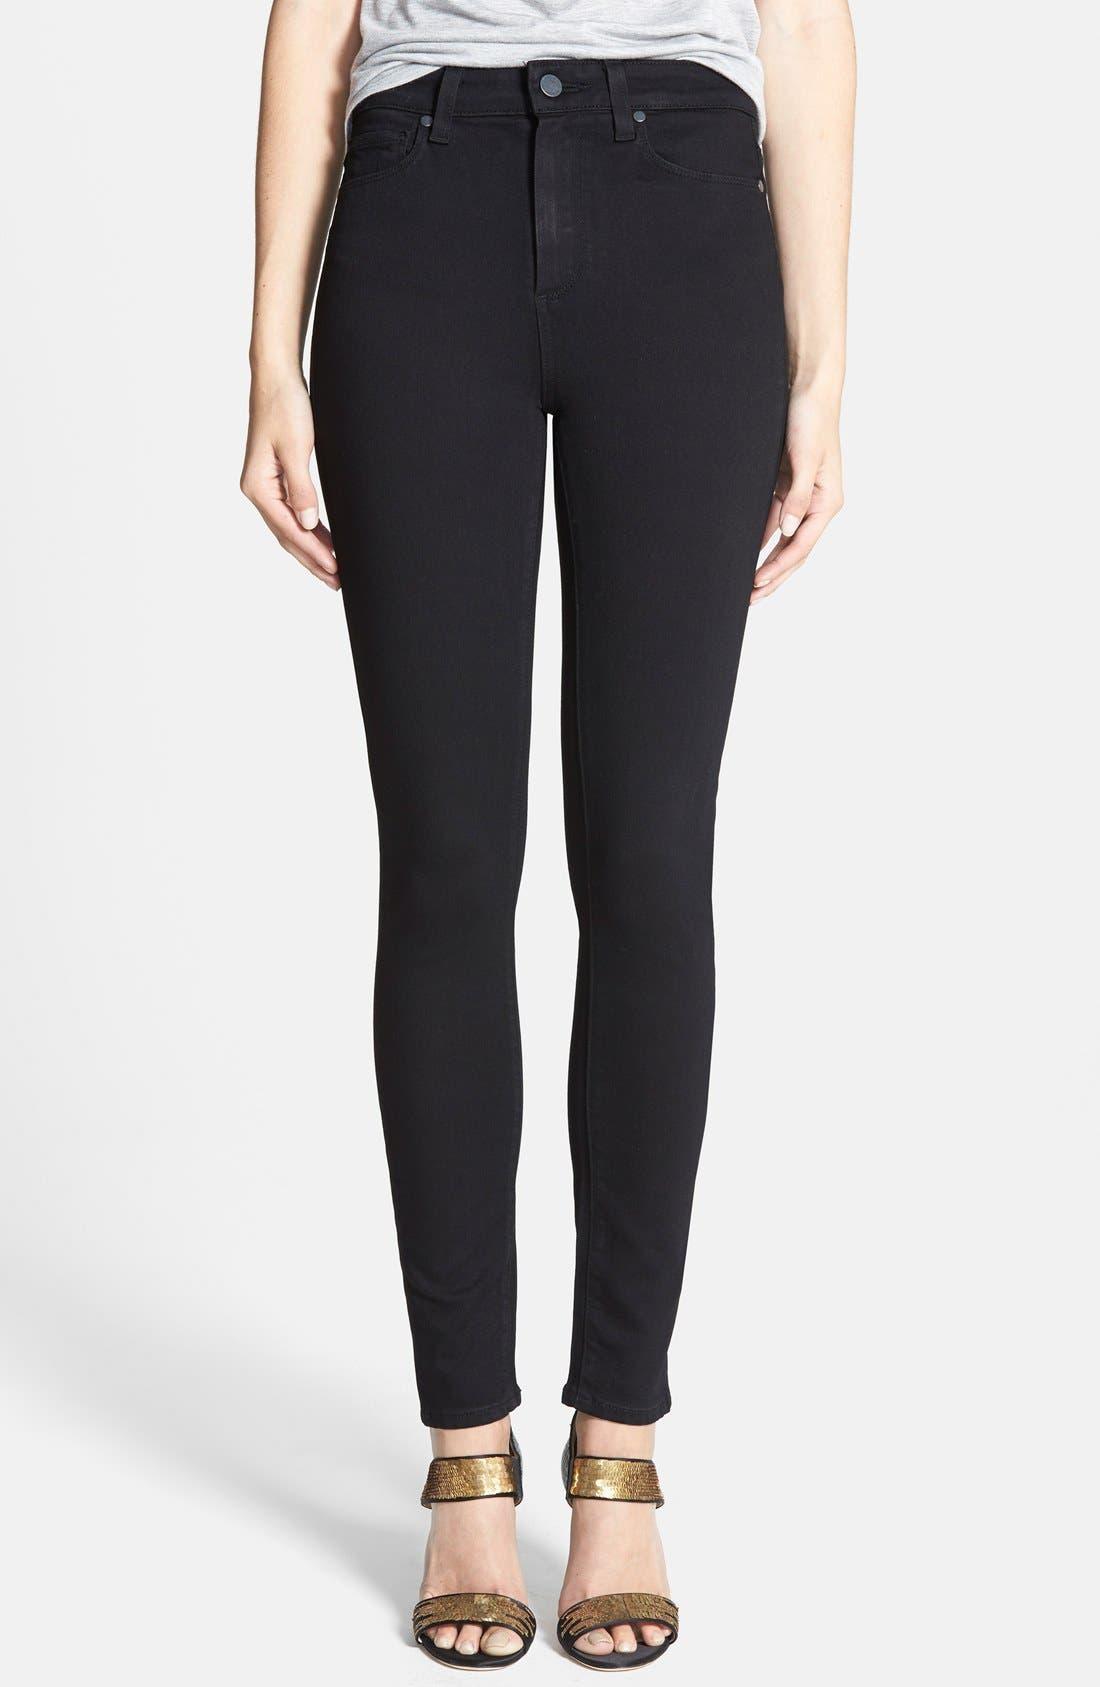 Margot High Waist Ultra Skinny Jeans,                         Main,                         color, Black Shadow